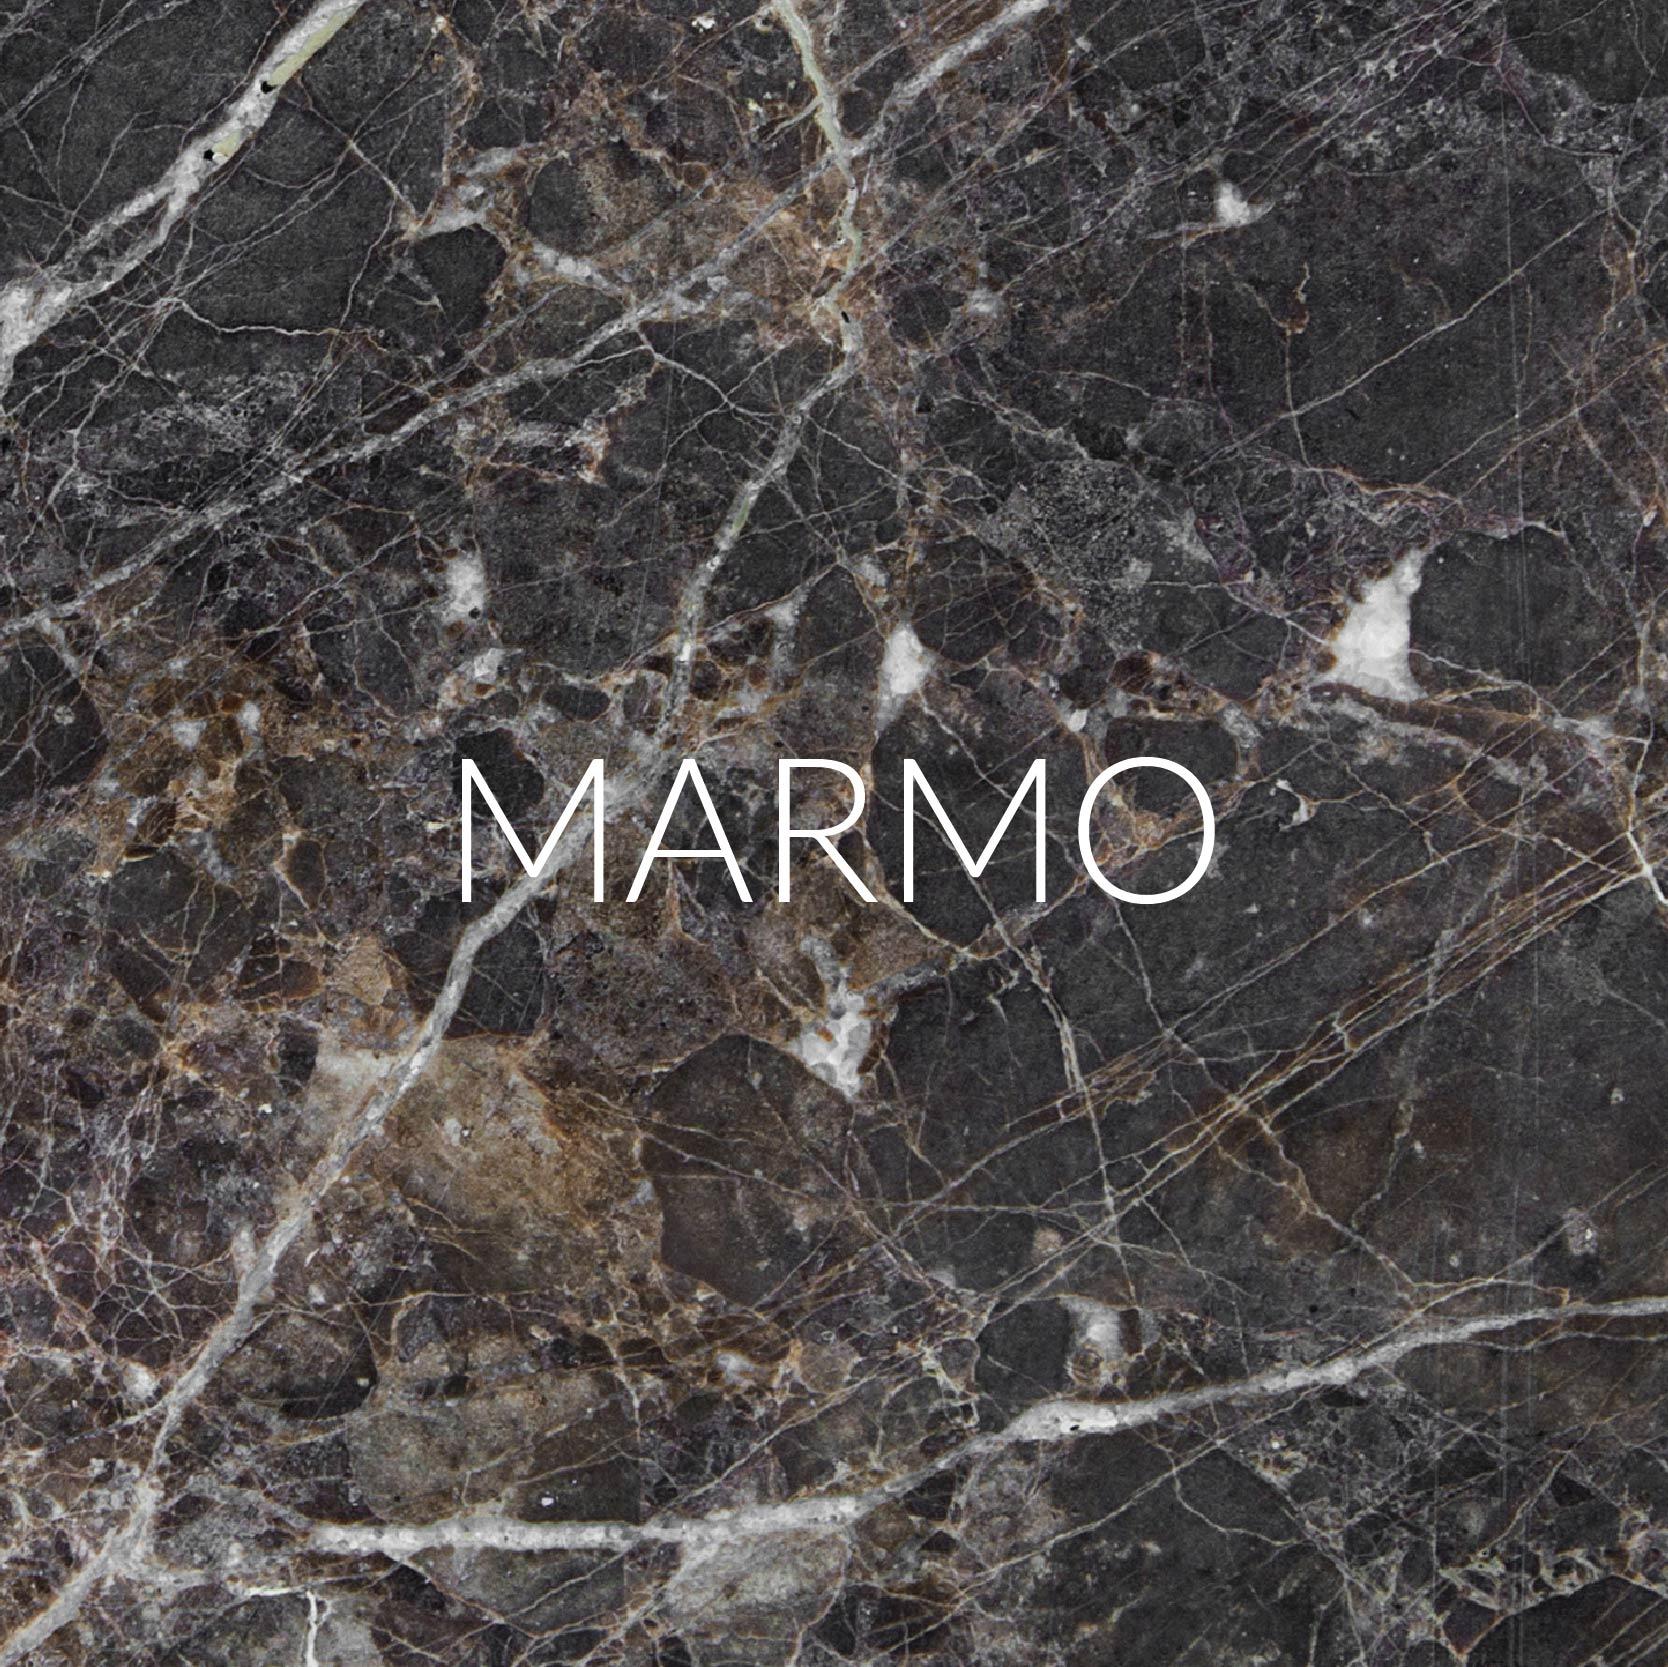 marmo_1